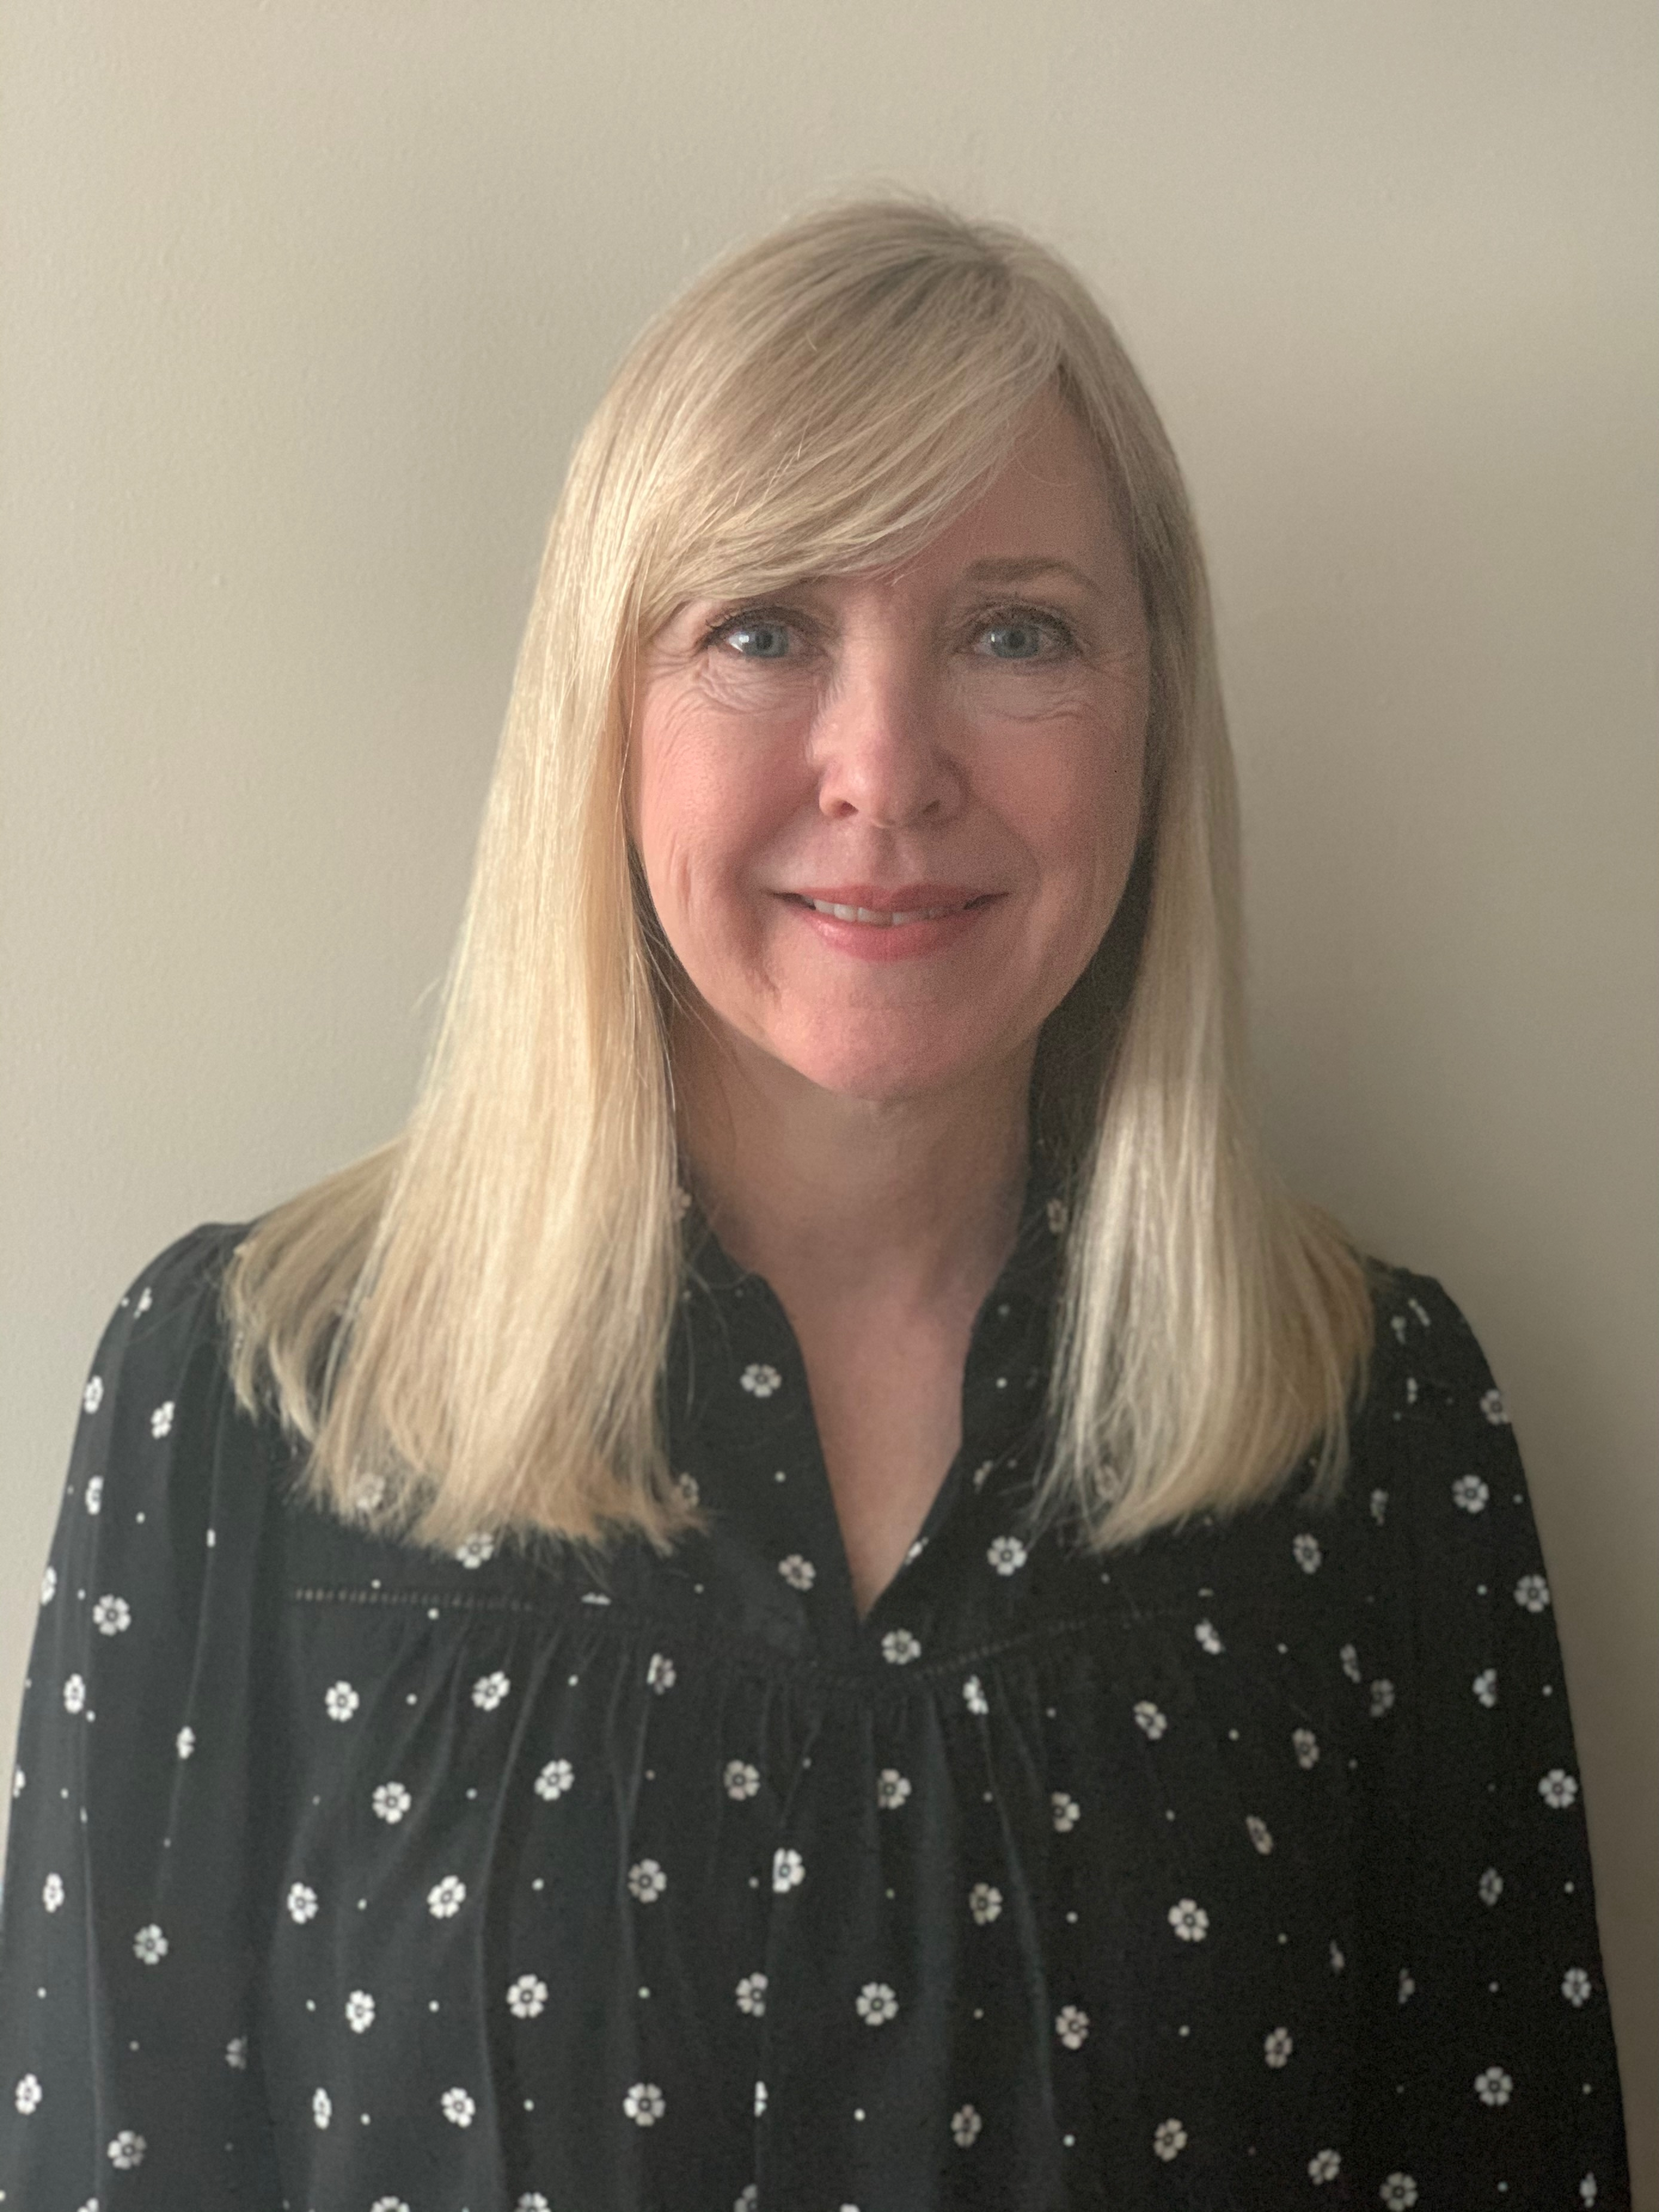 Kimberly Evans, PhD